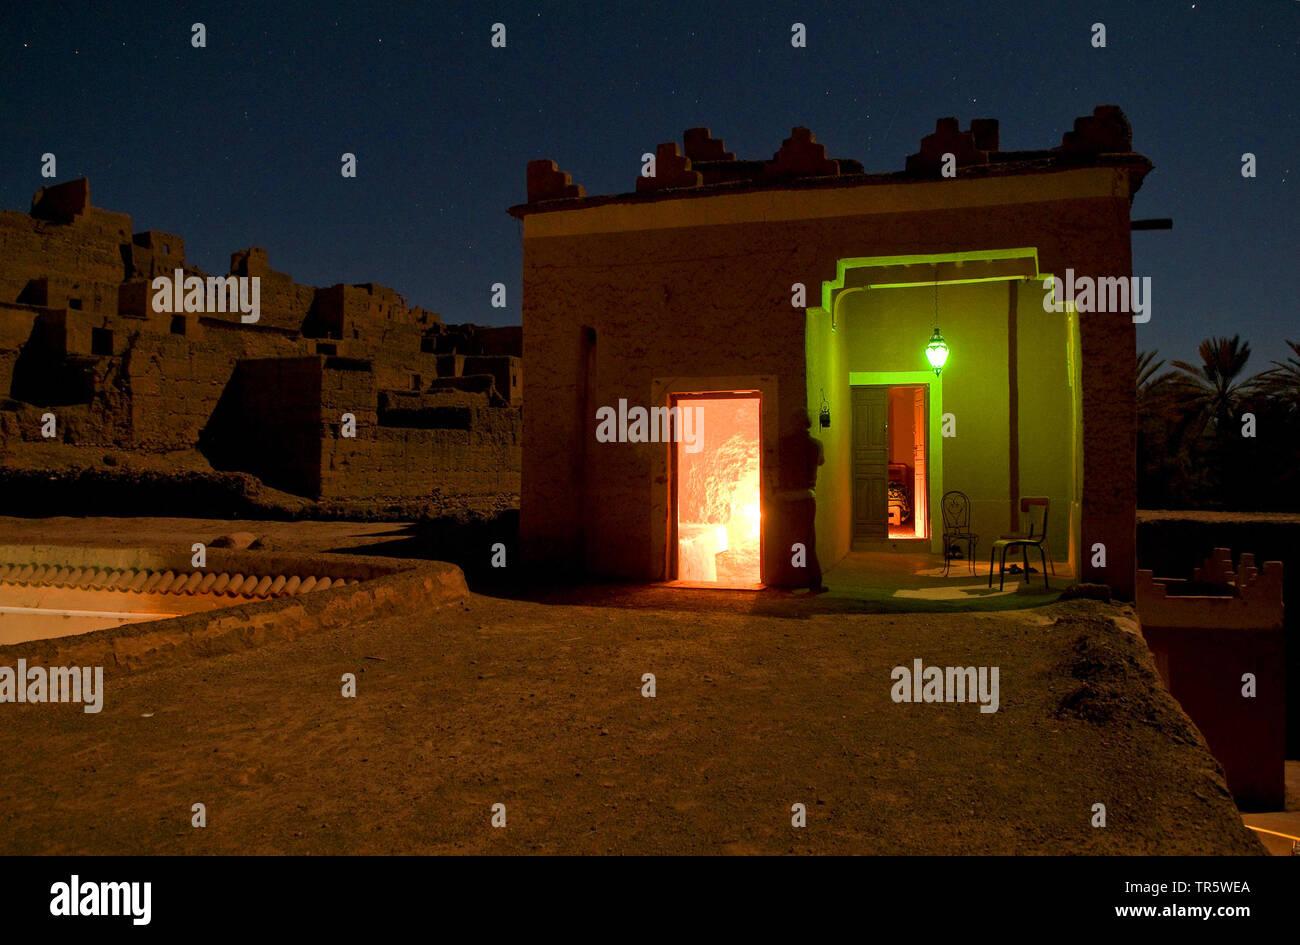 illuminated room at berber mud castle Cais Ali, Morocco, Agdz Kasbah Stock Photo